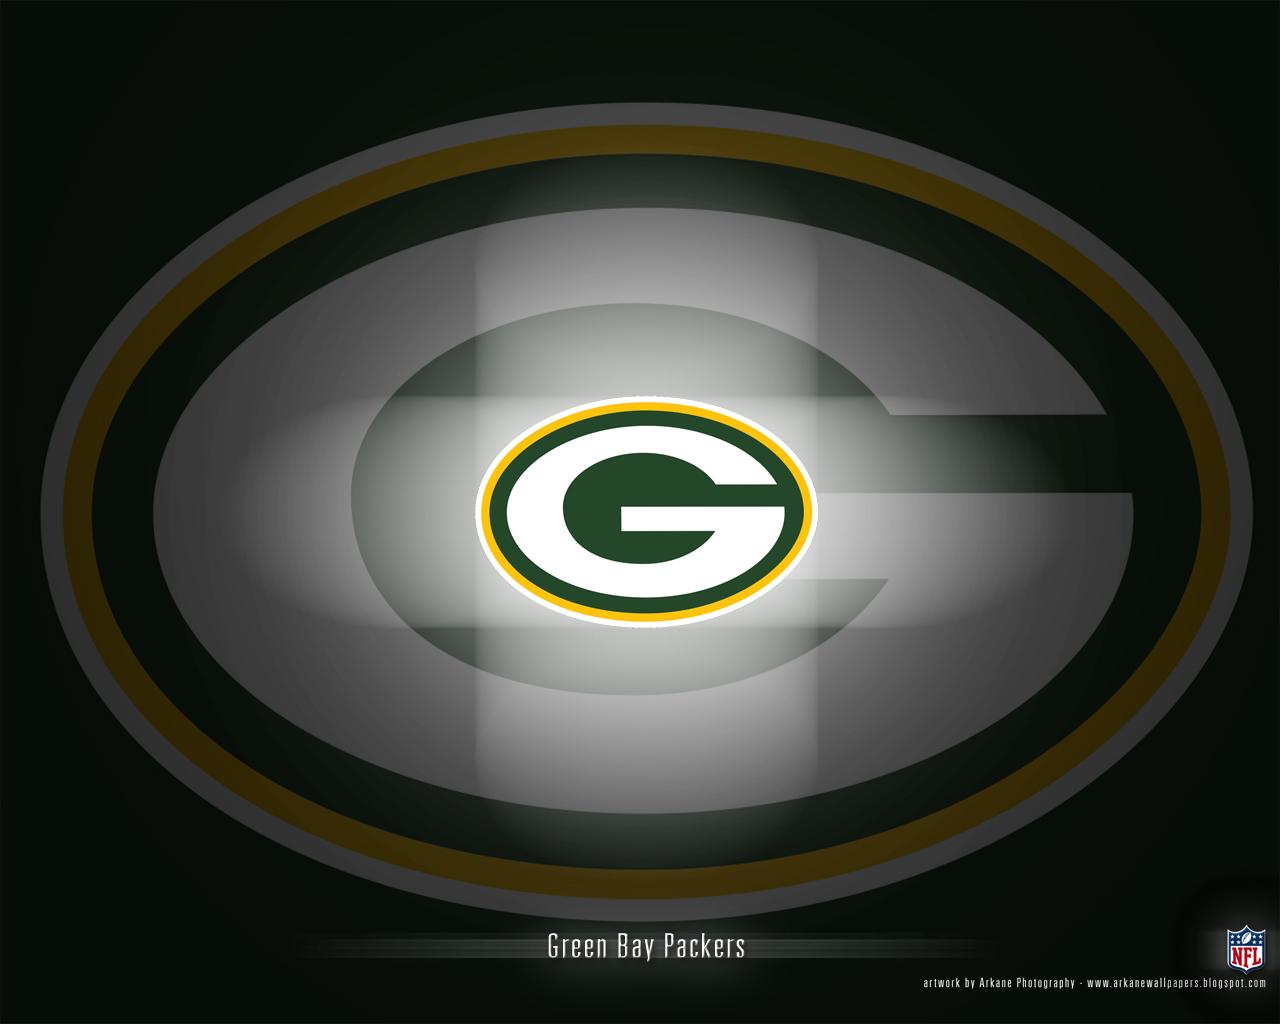 Arkane Nfl Wallpapers Green Bay Packers Vol 1